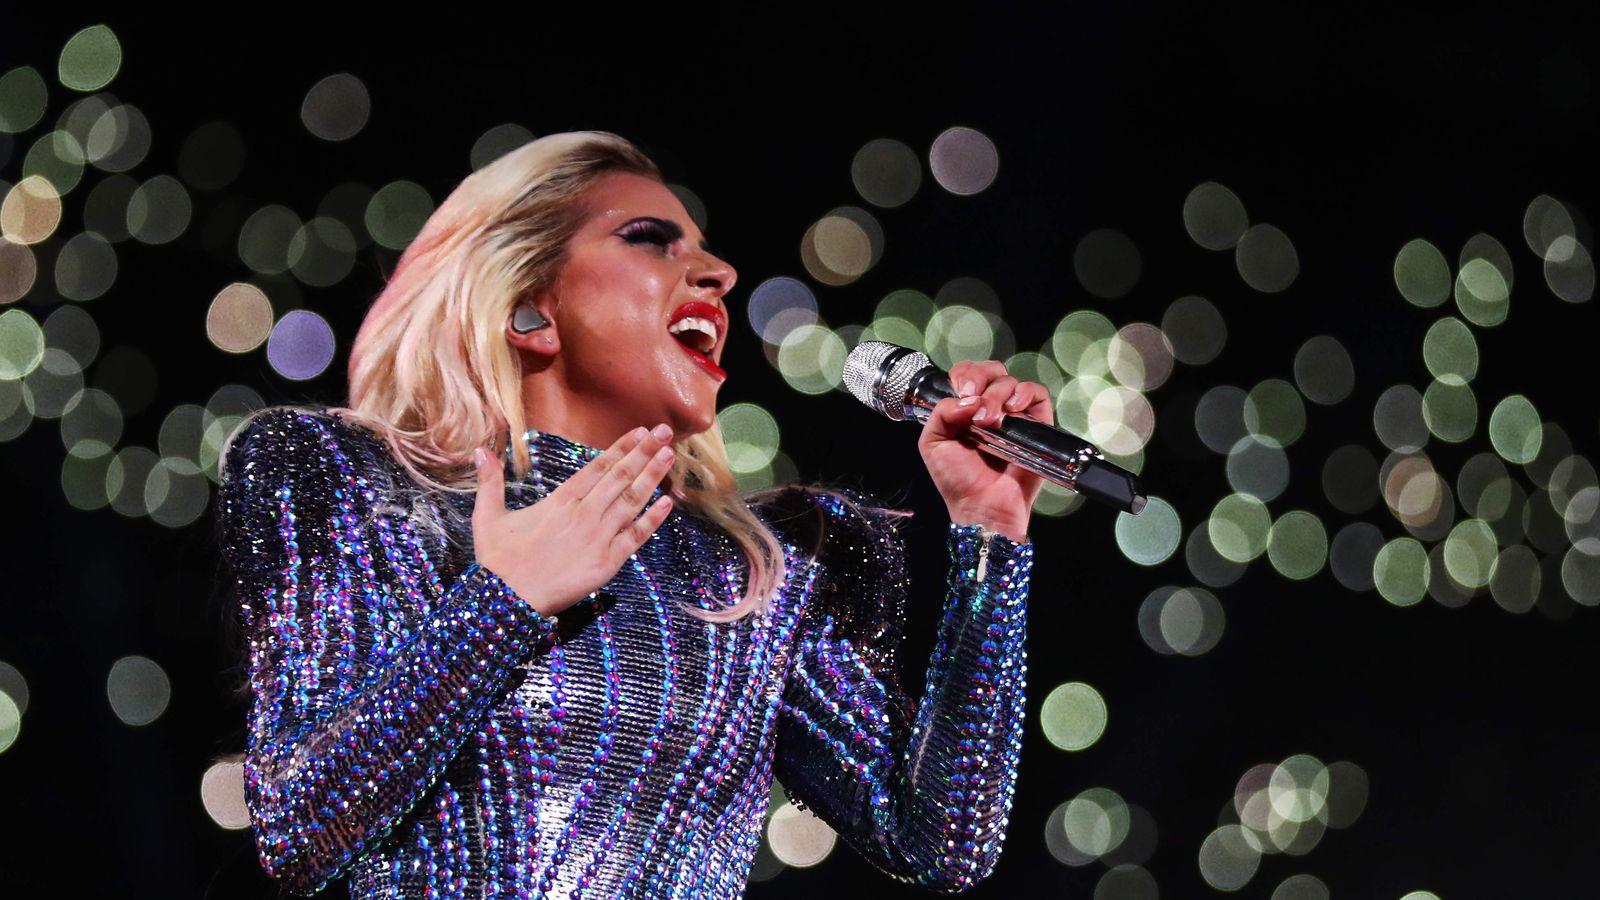 Trending Songs For TikTok Videos 2021 By Lady Gaga